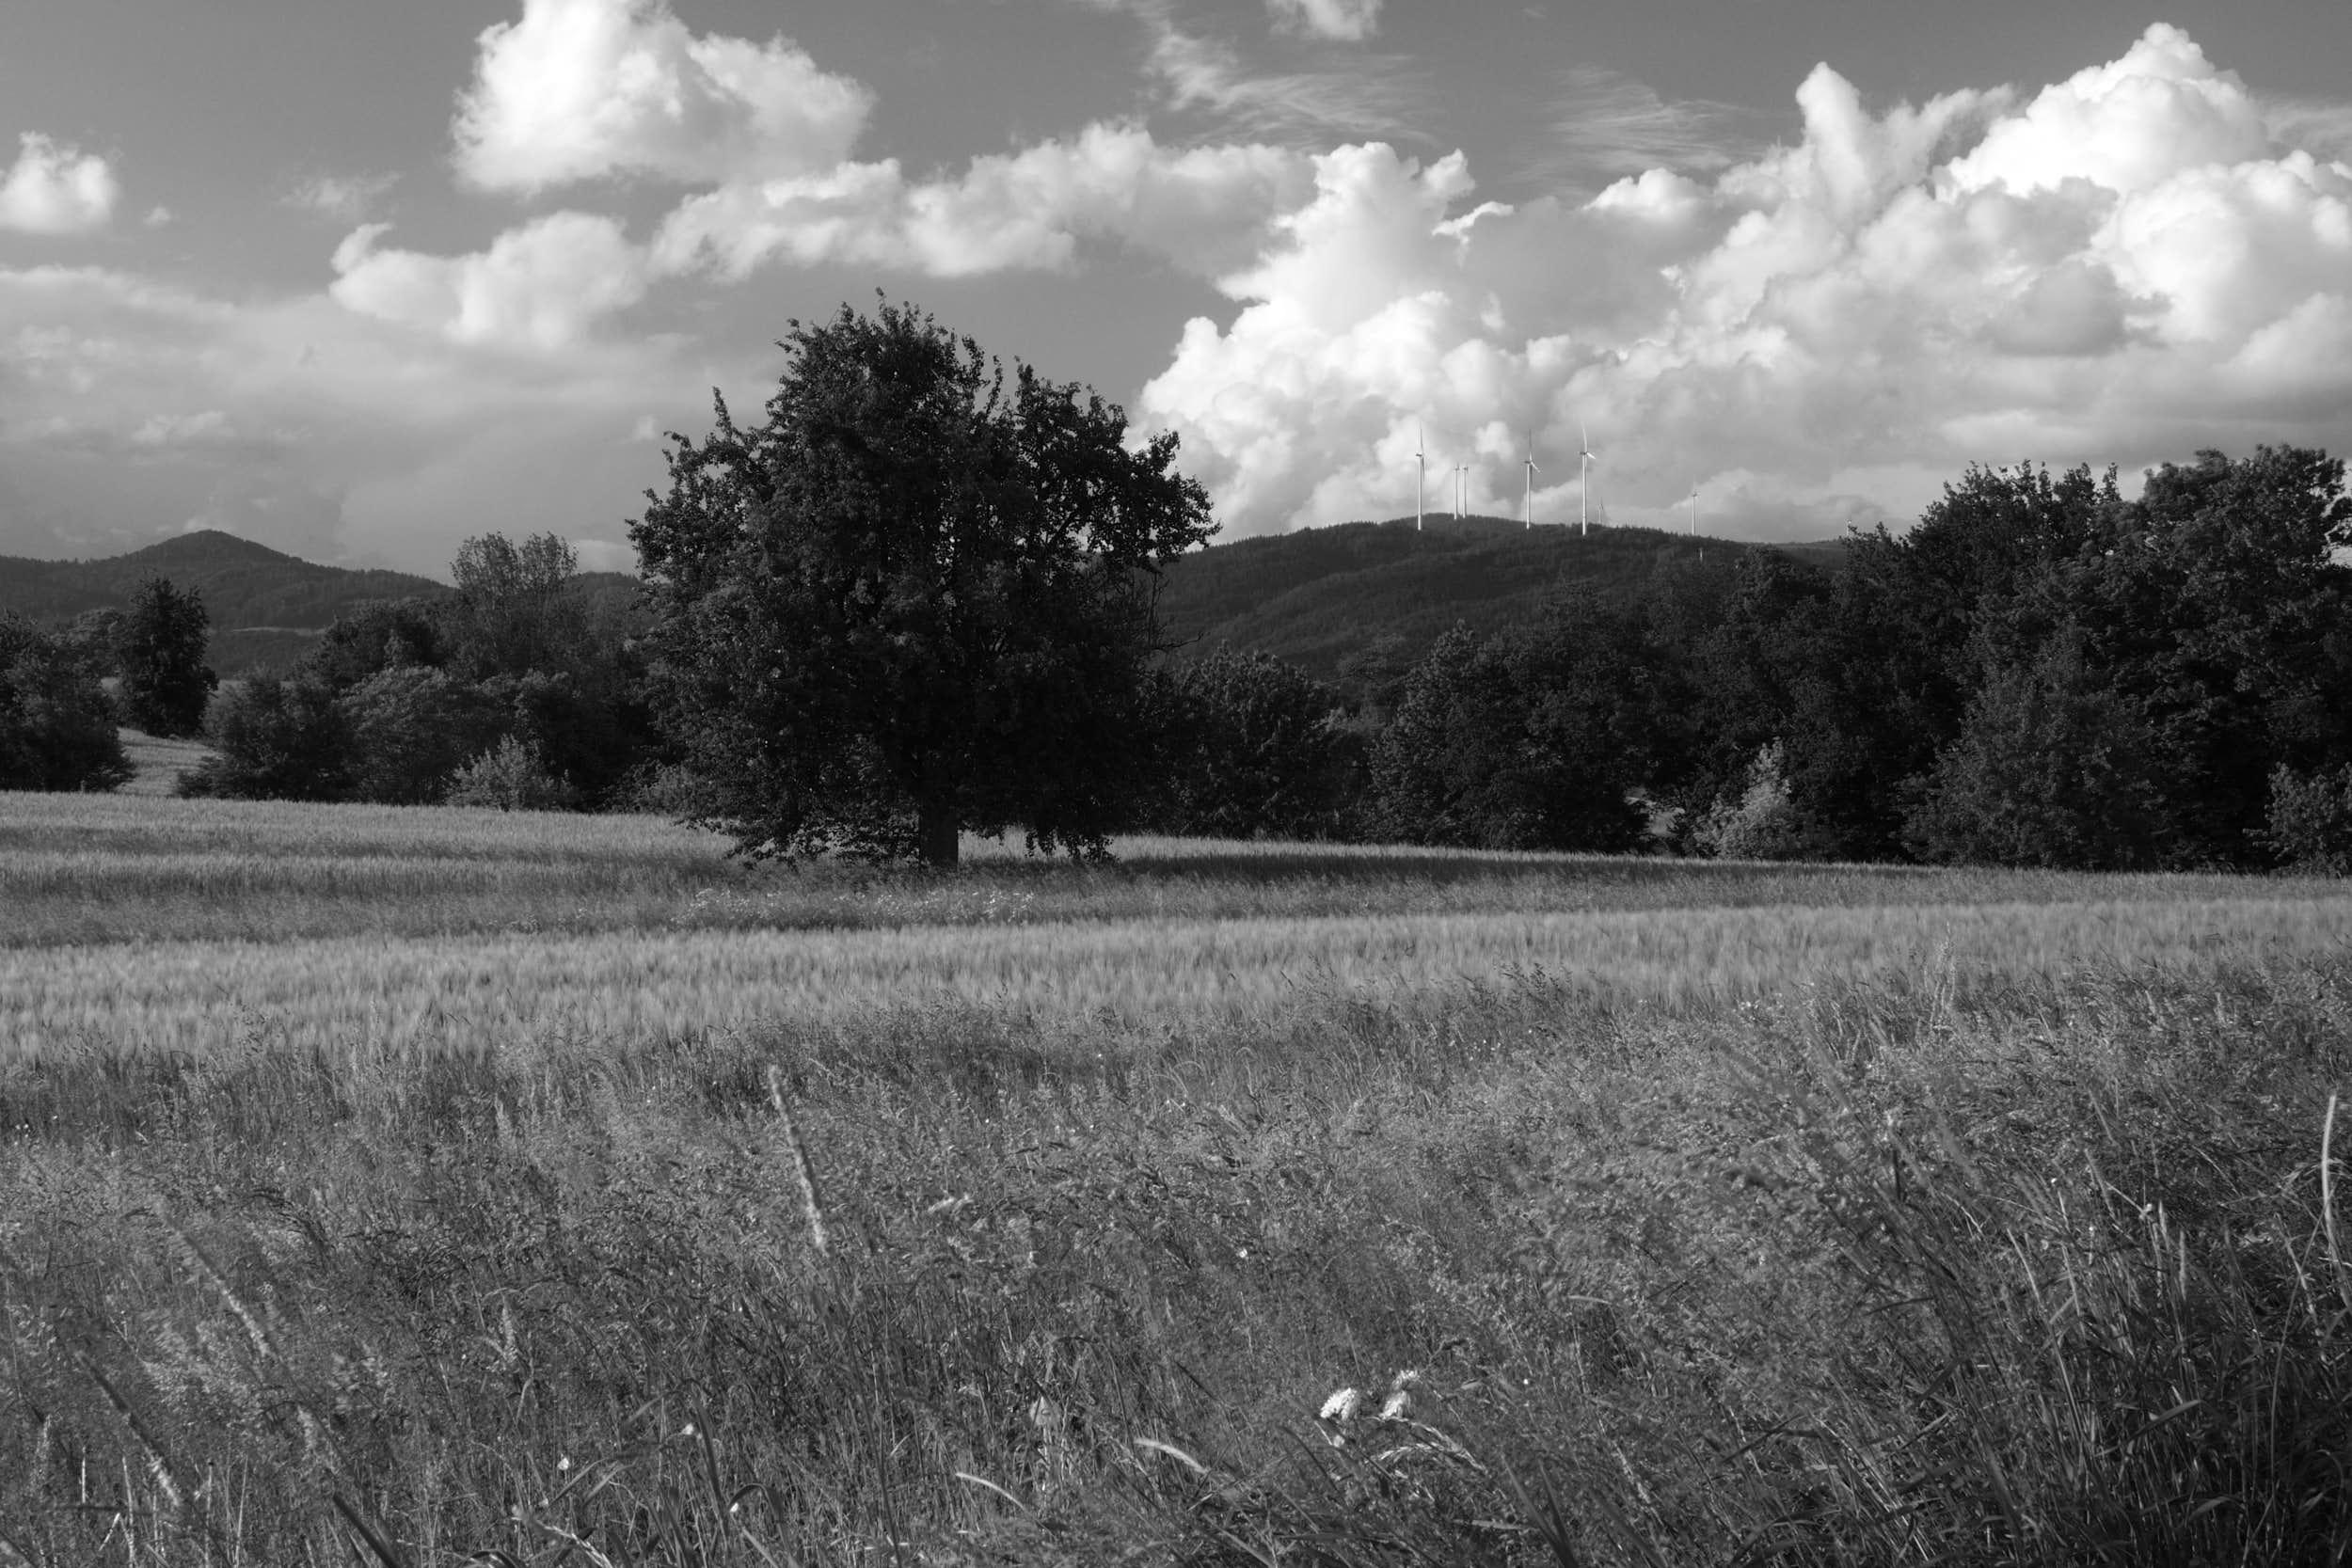 n90.photography-18-05-20-0051.jpg